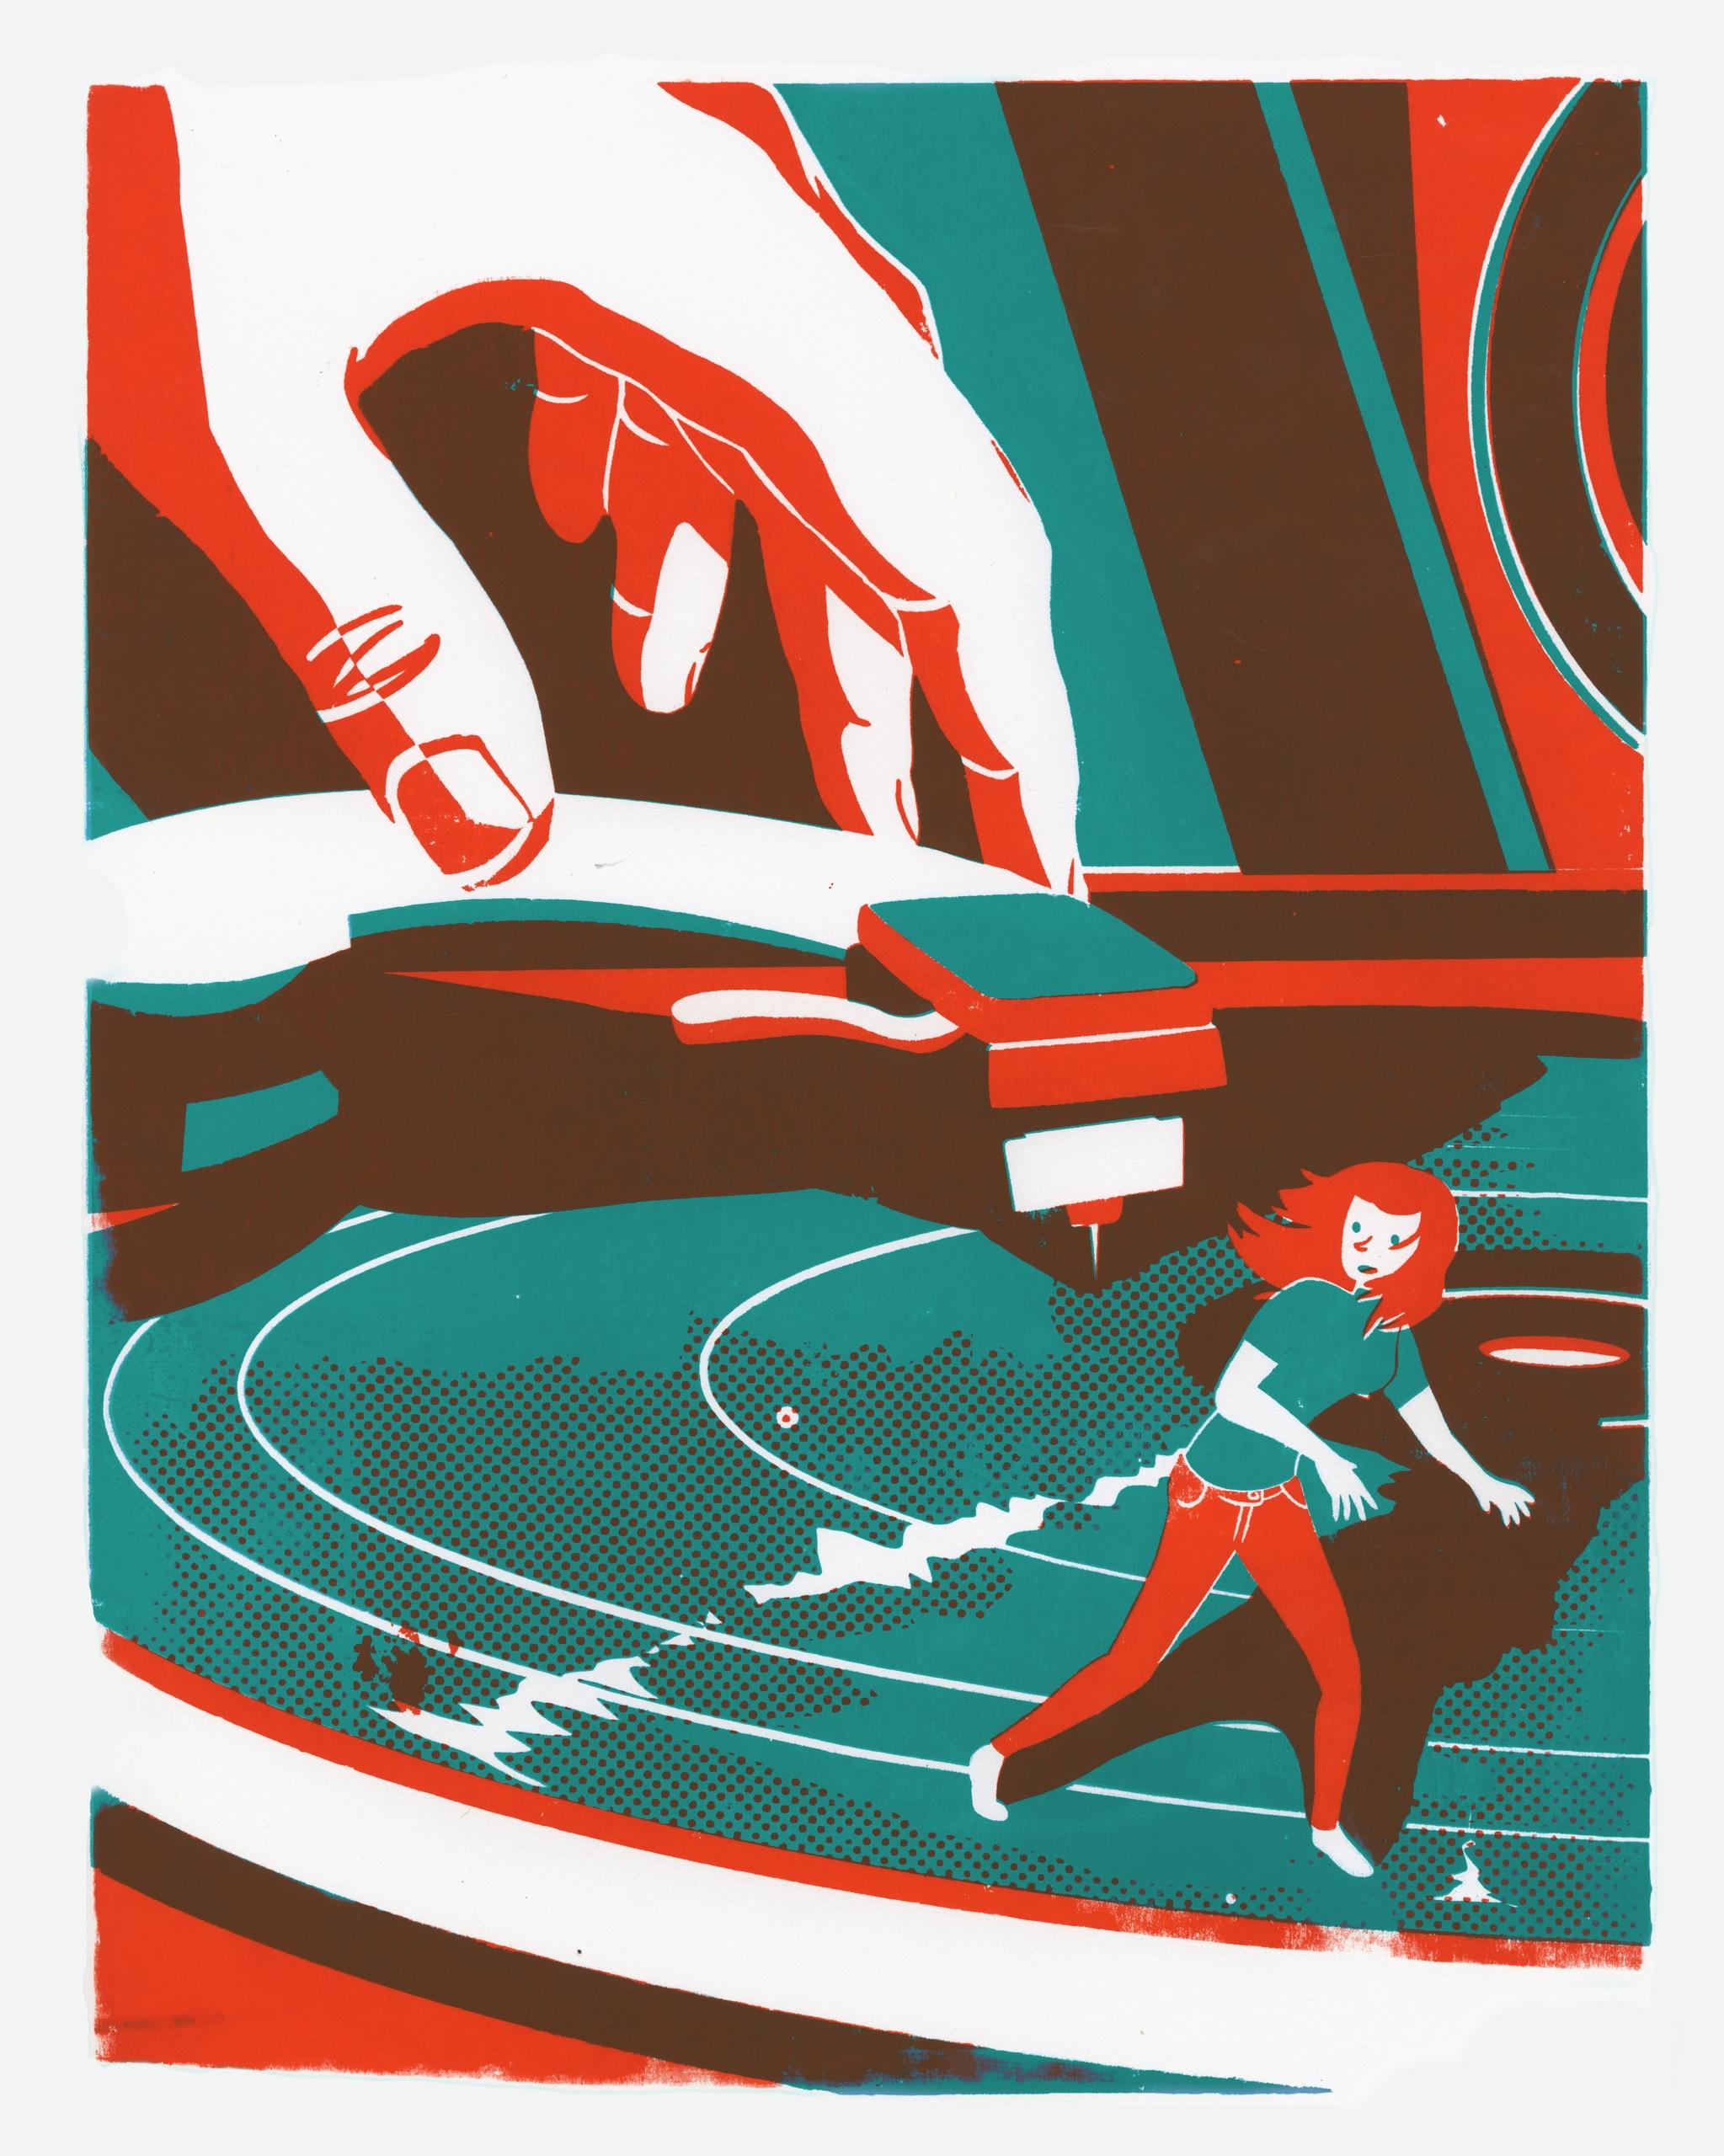 Vinyl Treadmill - illustration, screenprint - rosie-1055 | ello